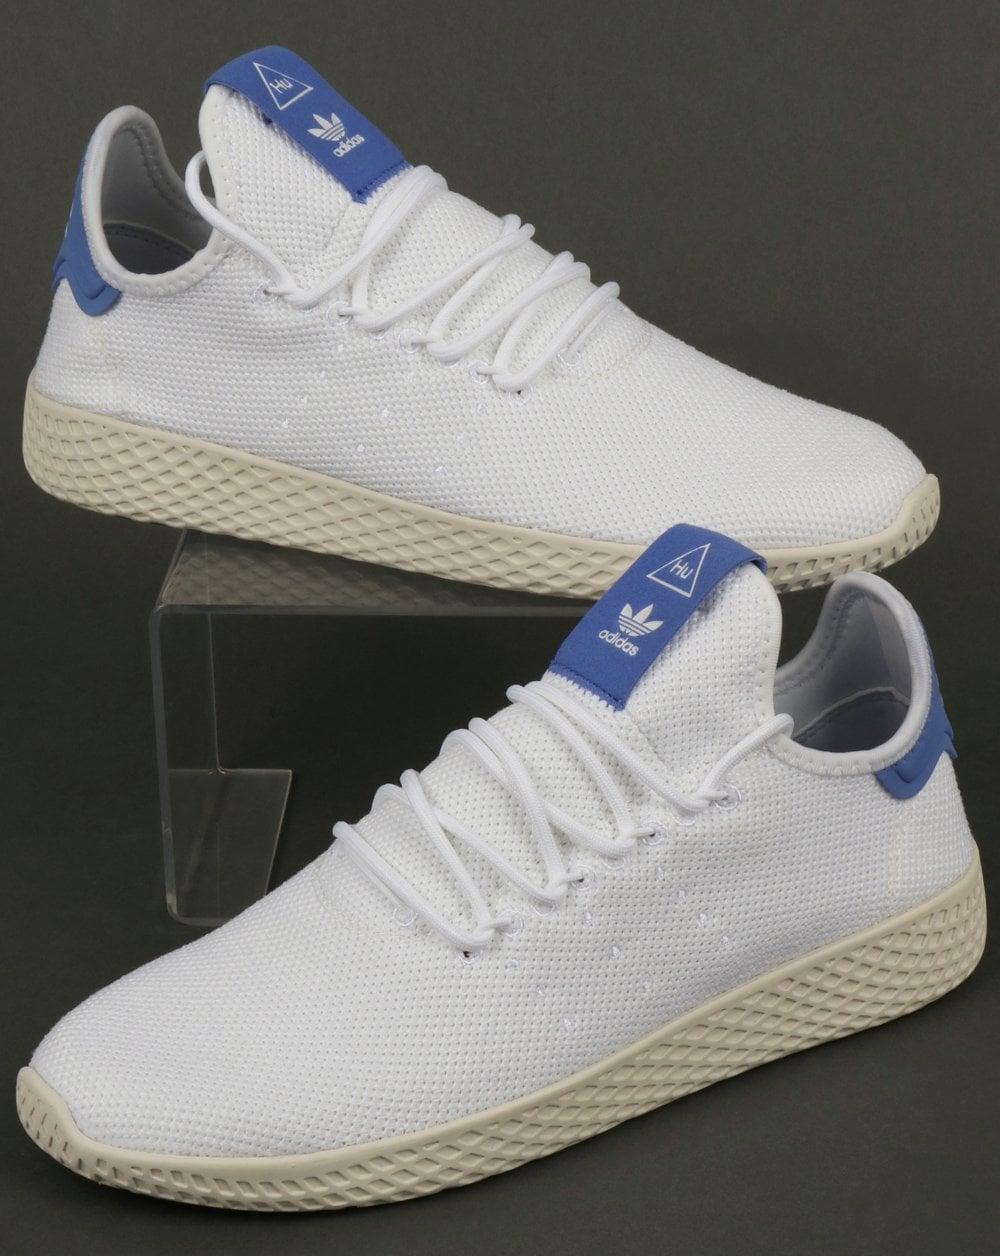 Adidas PW Tennis HU Trainers White Blue c72c2c33e4